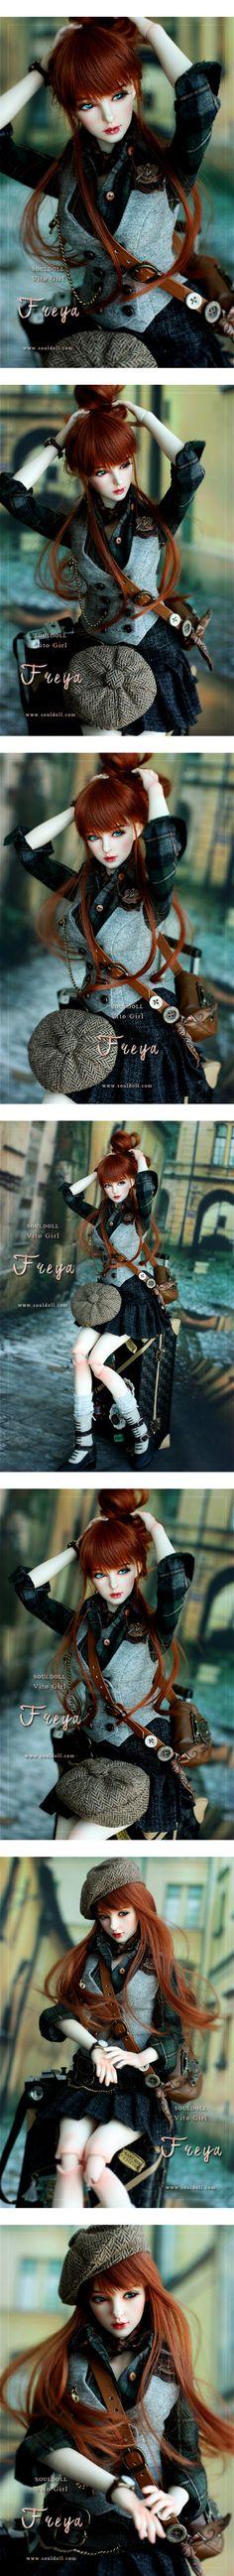 Souldoll Vito girl Freya More